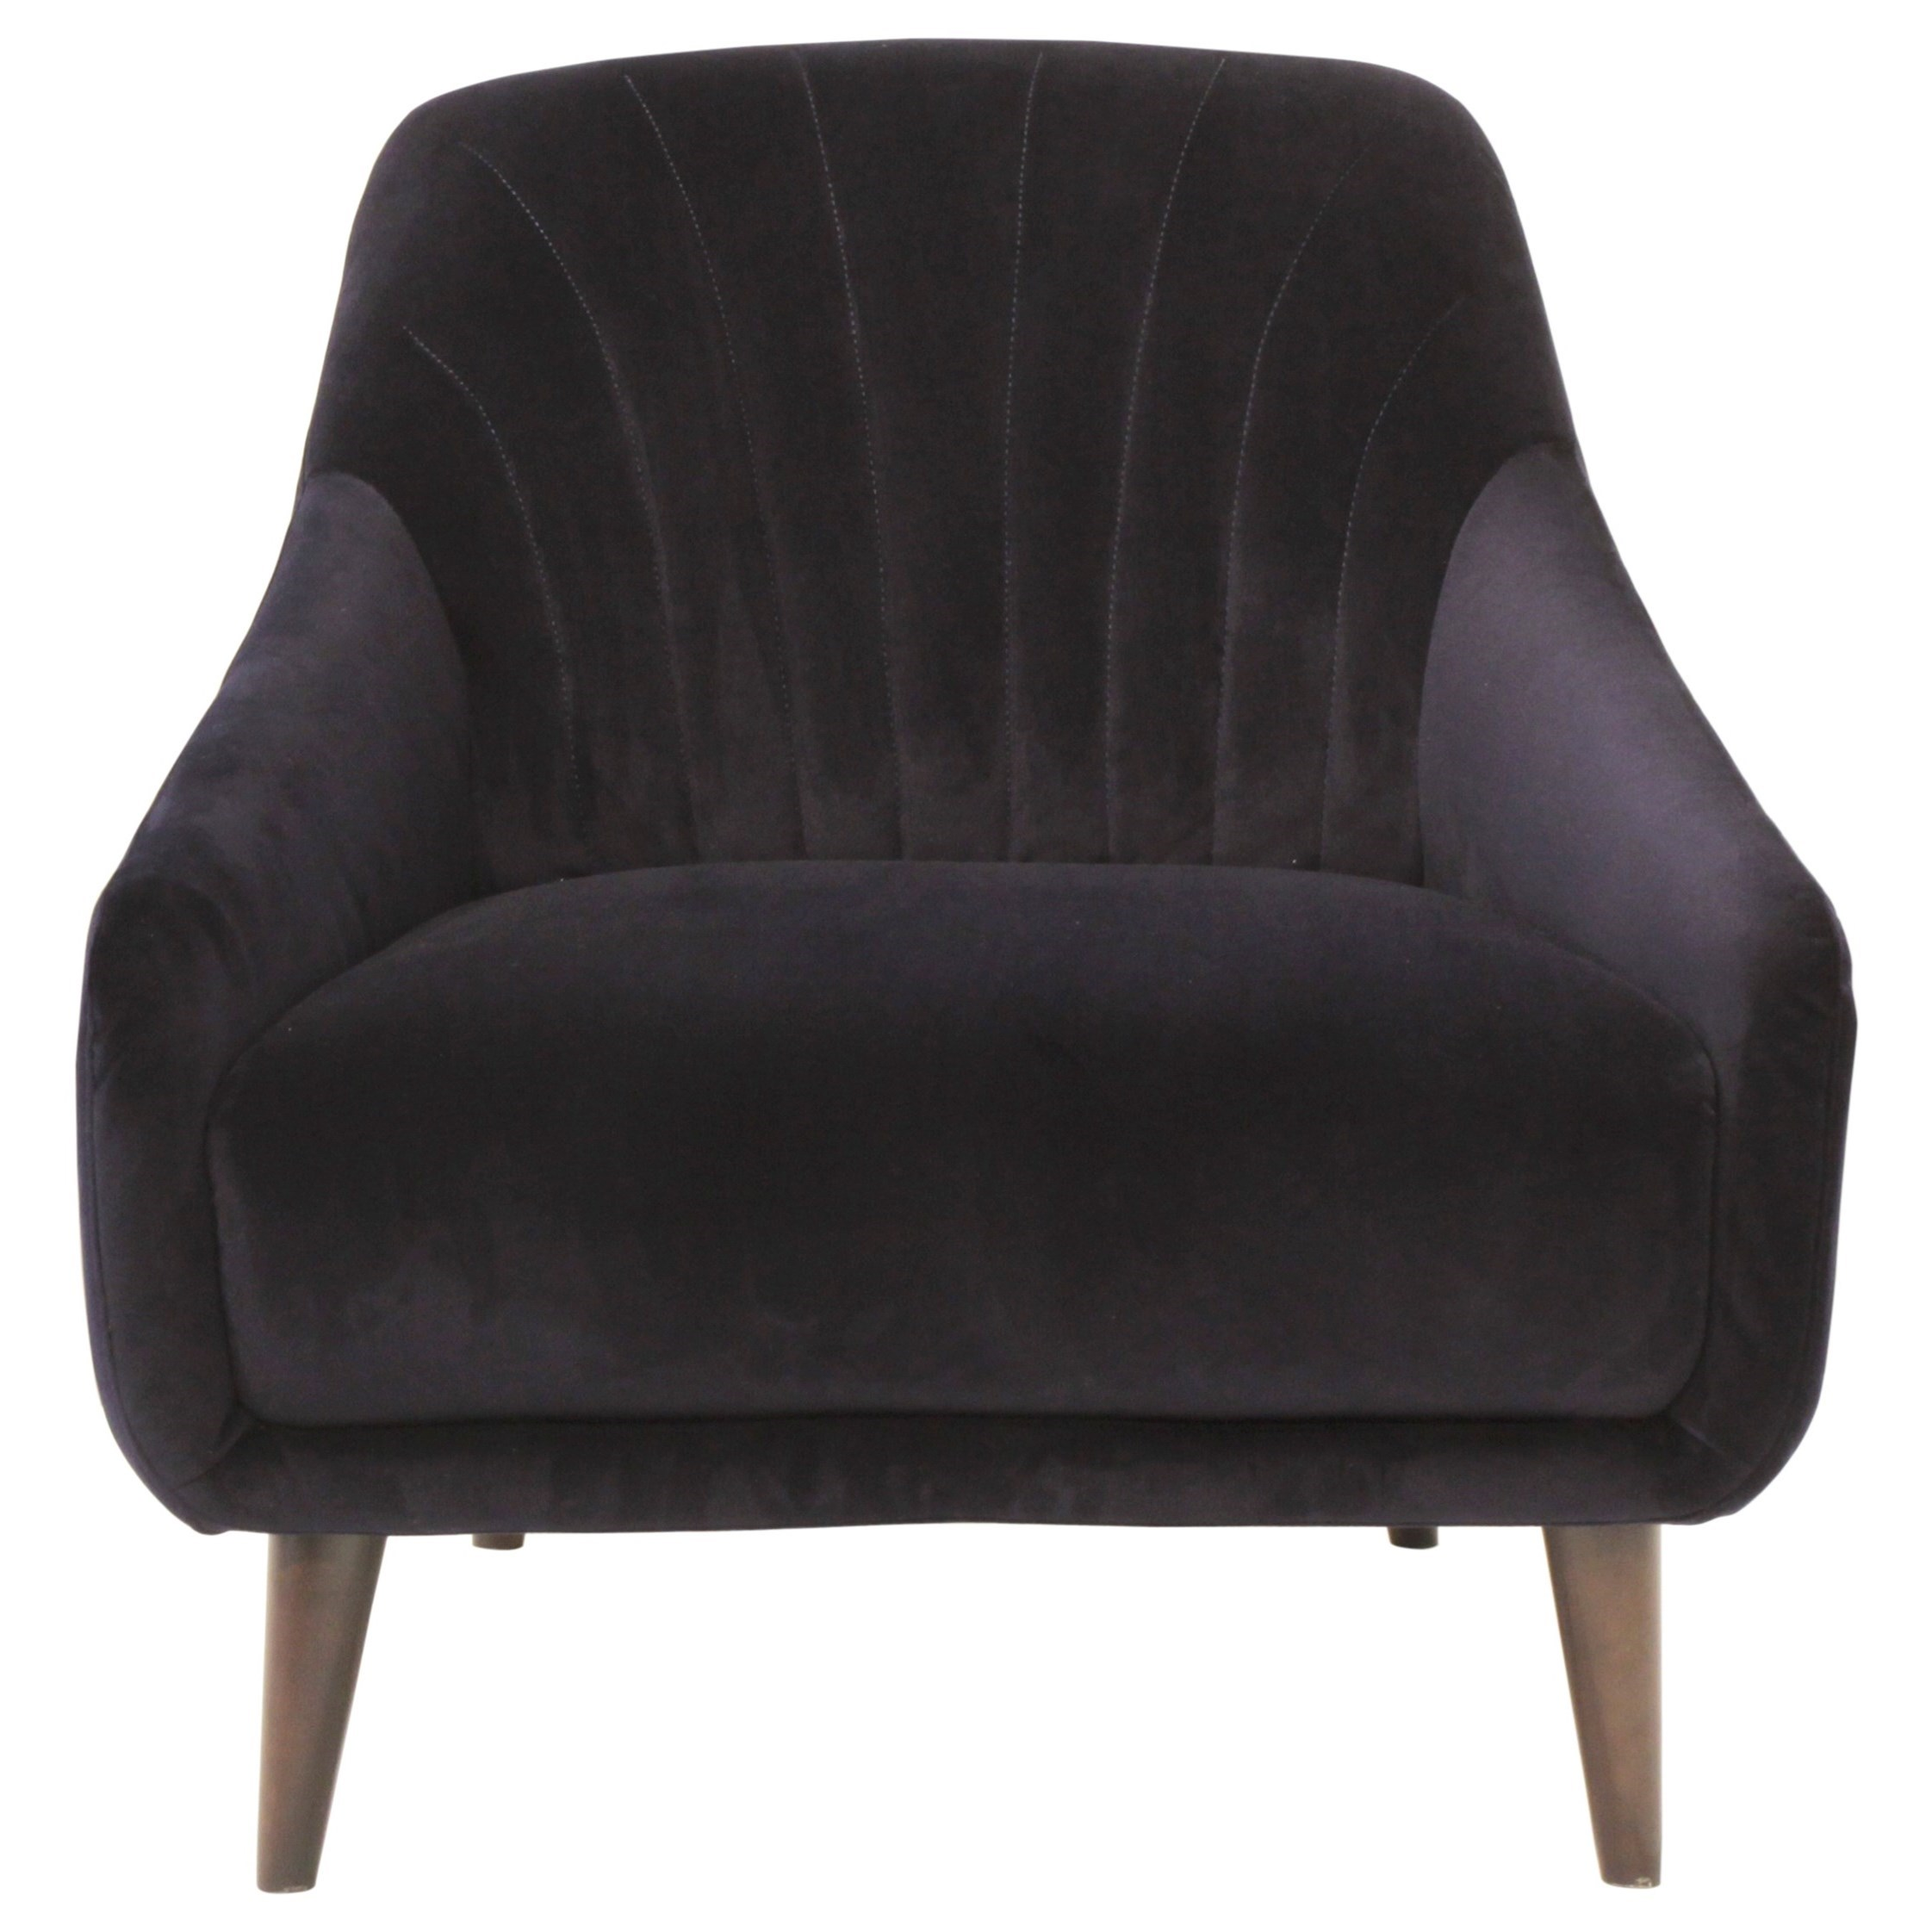 Natuzzi Editions Felicita Chair - Item Number: C014-003-Brezza Dark Blue